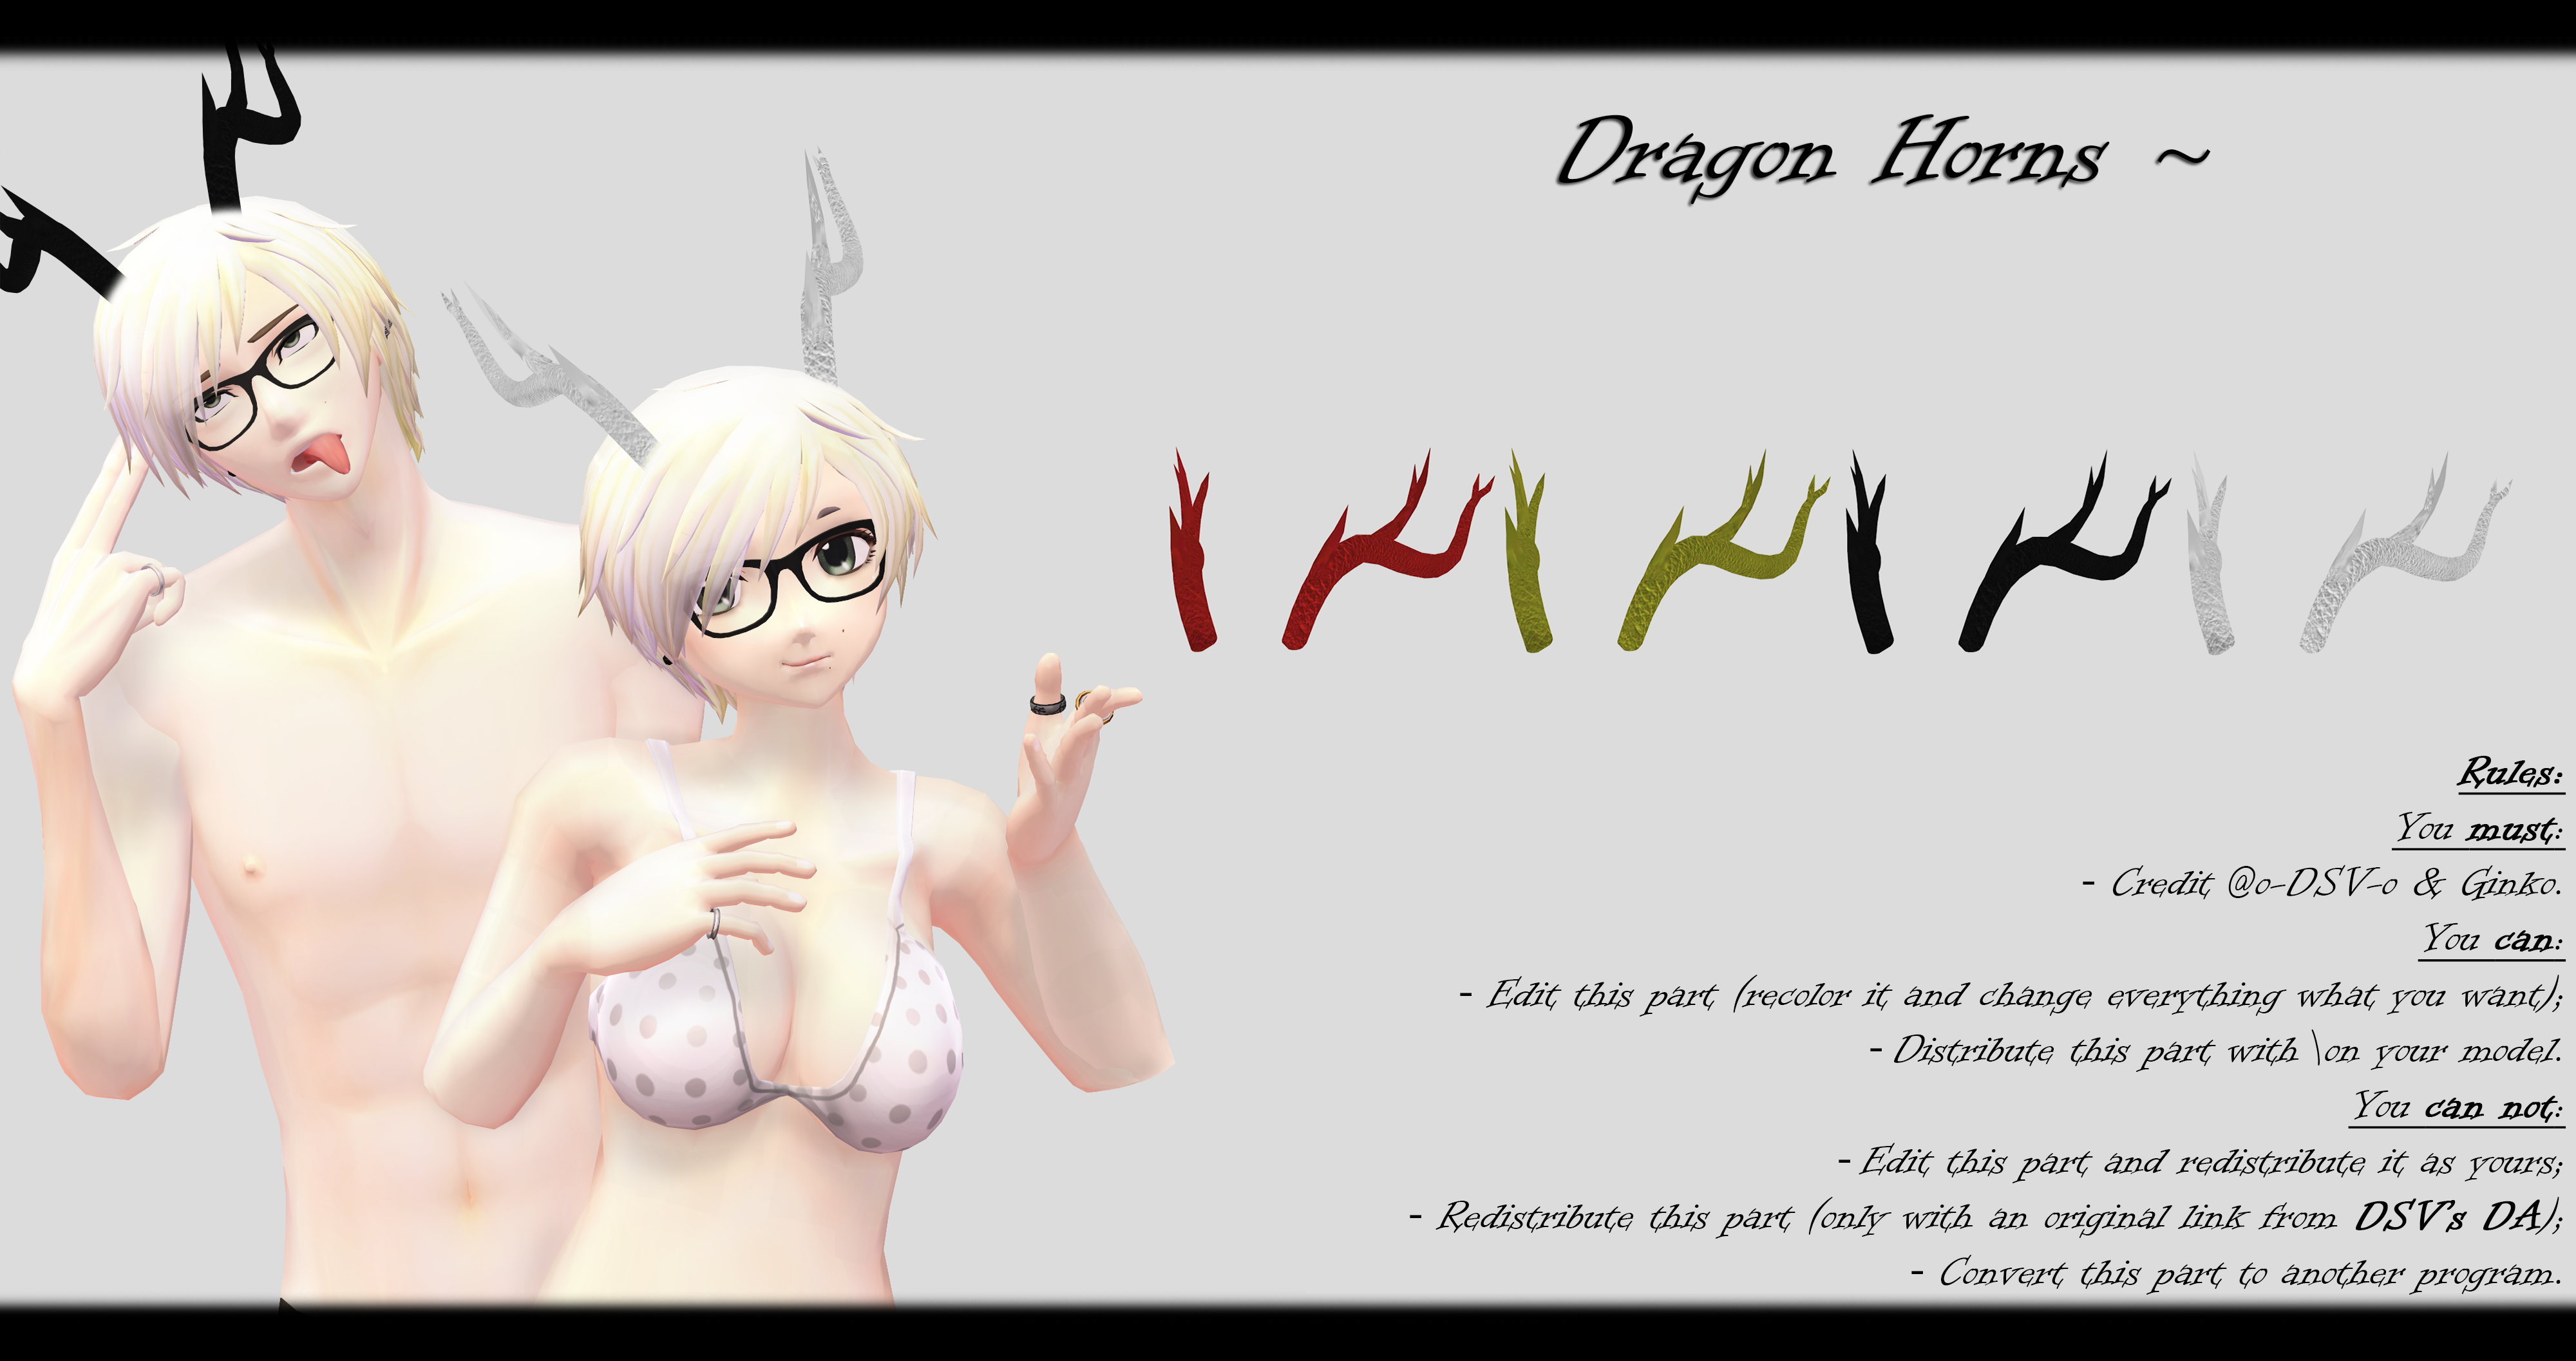 [MMD] Dragon Horns DL ~